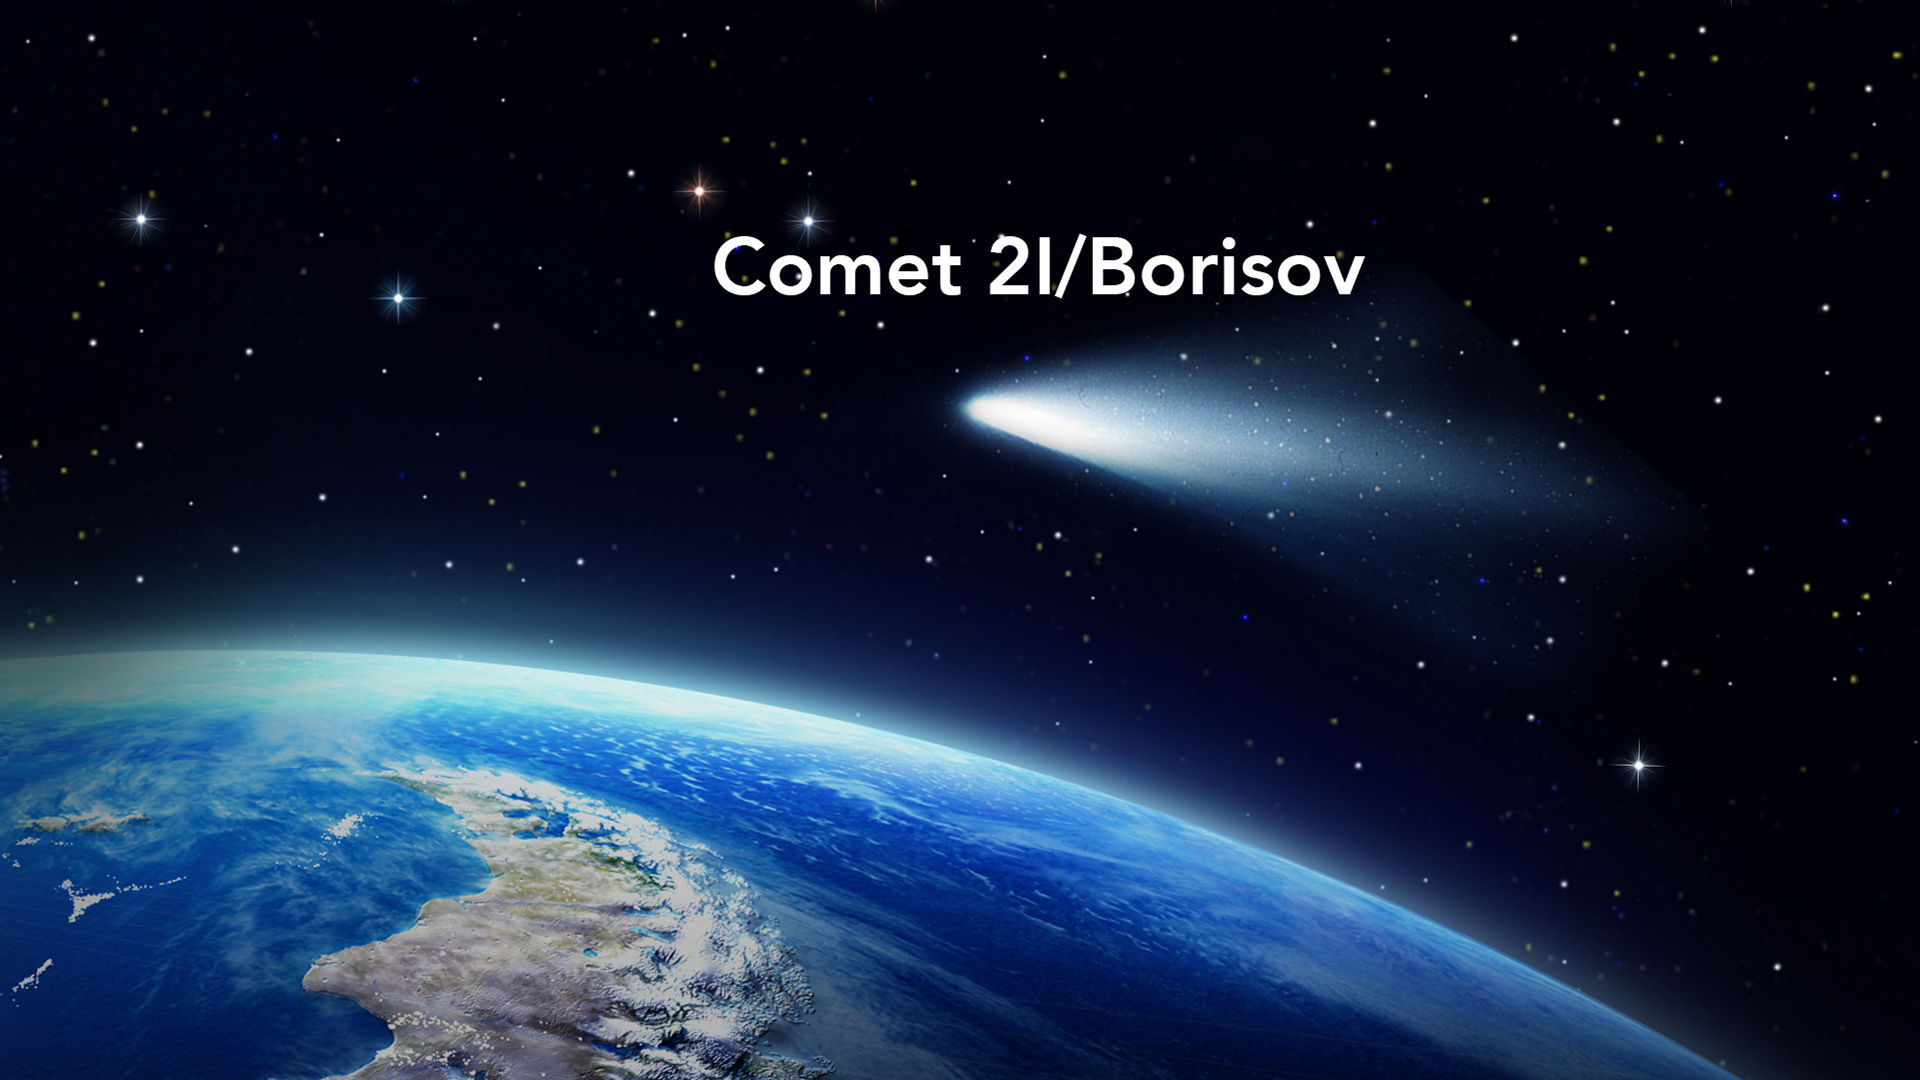 彗星2I/Borisov(2I/鲍里索夫)接近地球